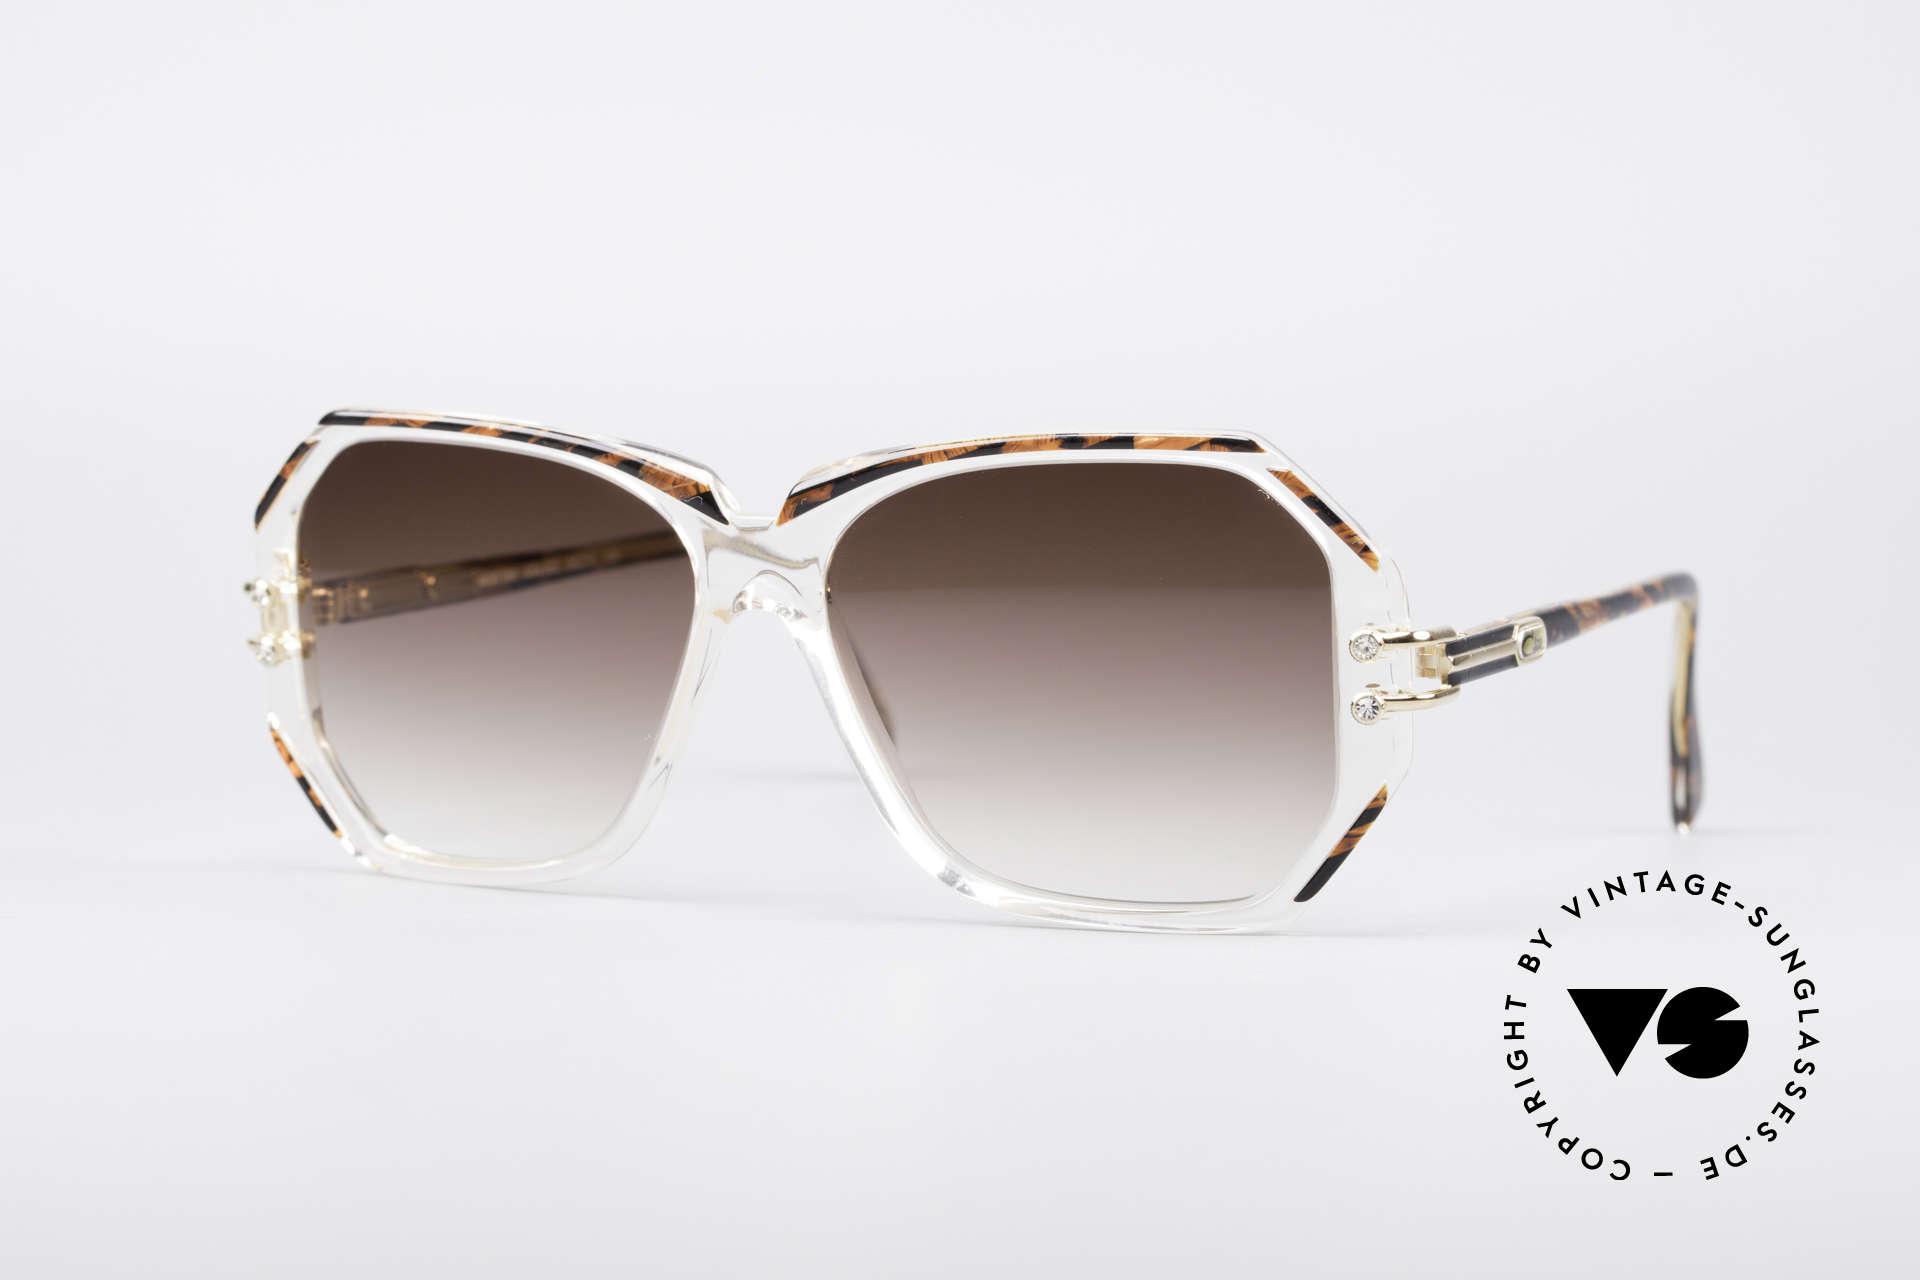 Cazal 169 Vintage Designer Shades, extravagant vintage CAZAL designer sunglasses, Made for Women